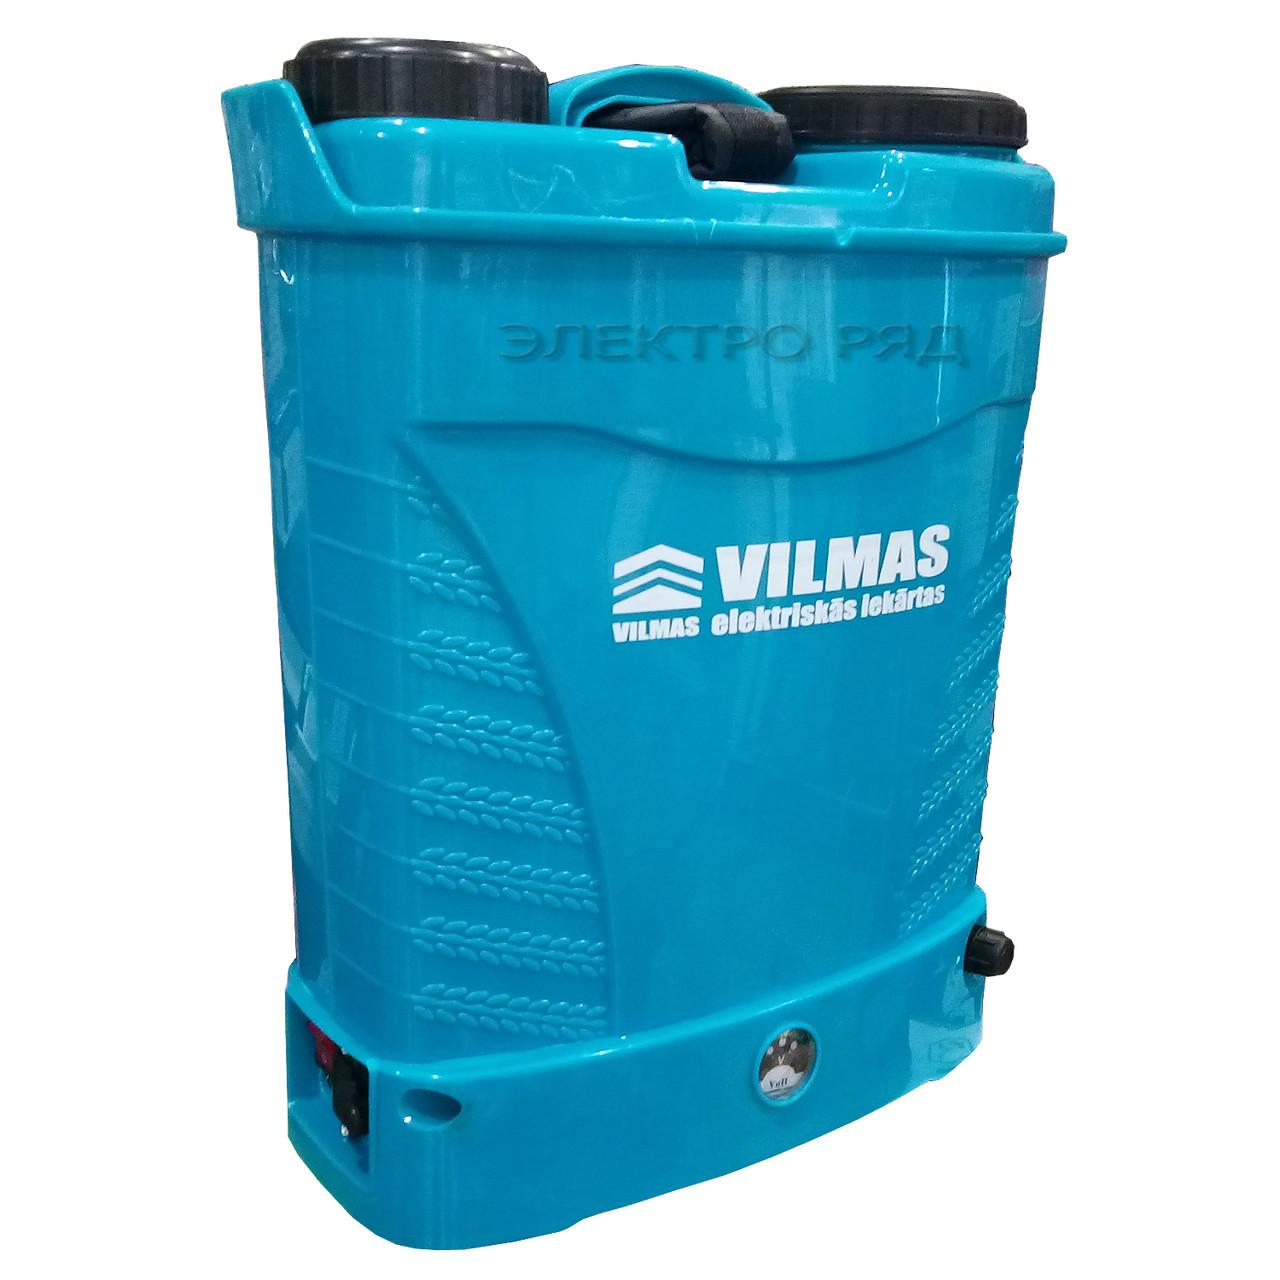 Аккумуляторный опрыскиватель Vilmas 16 BS 8